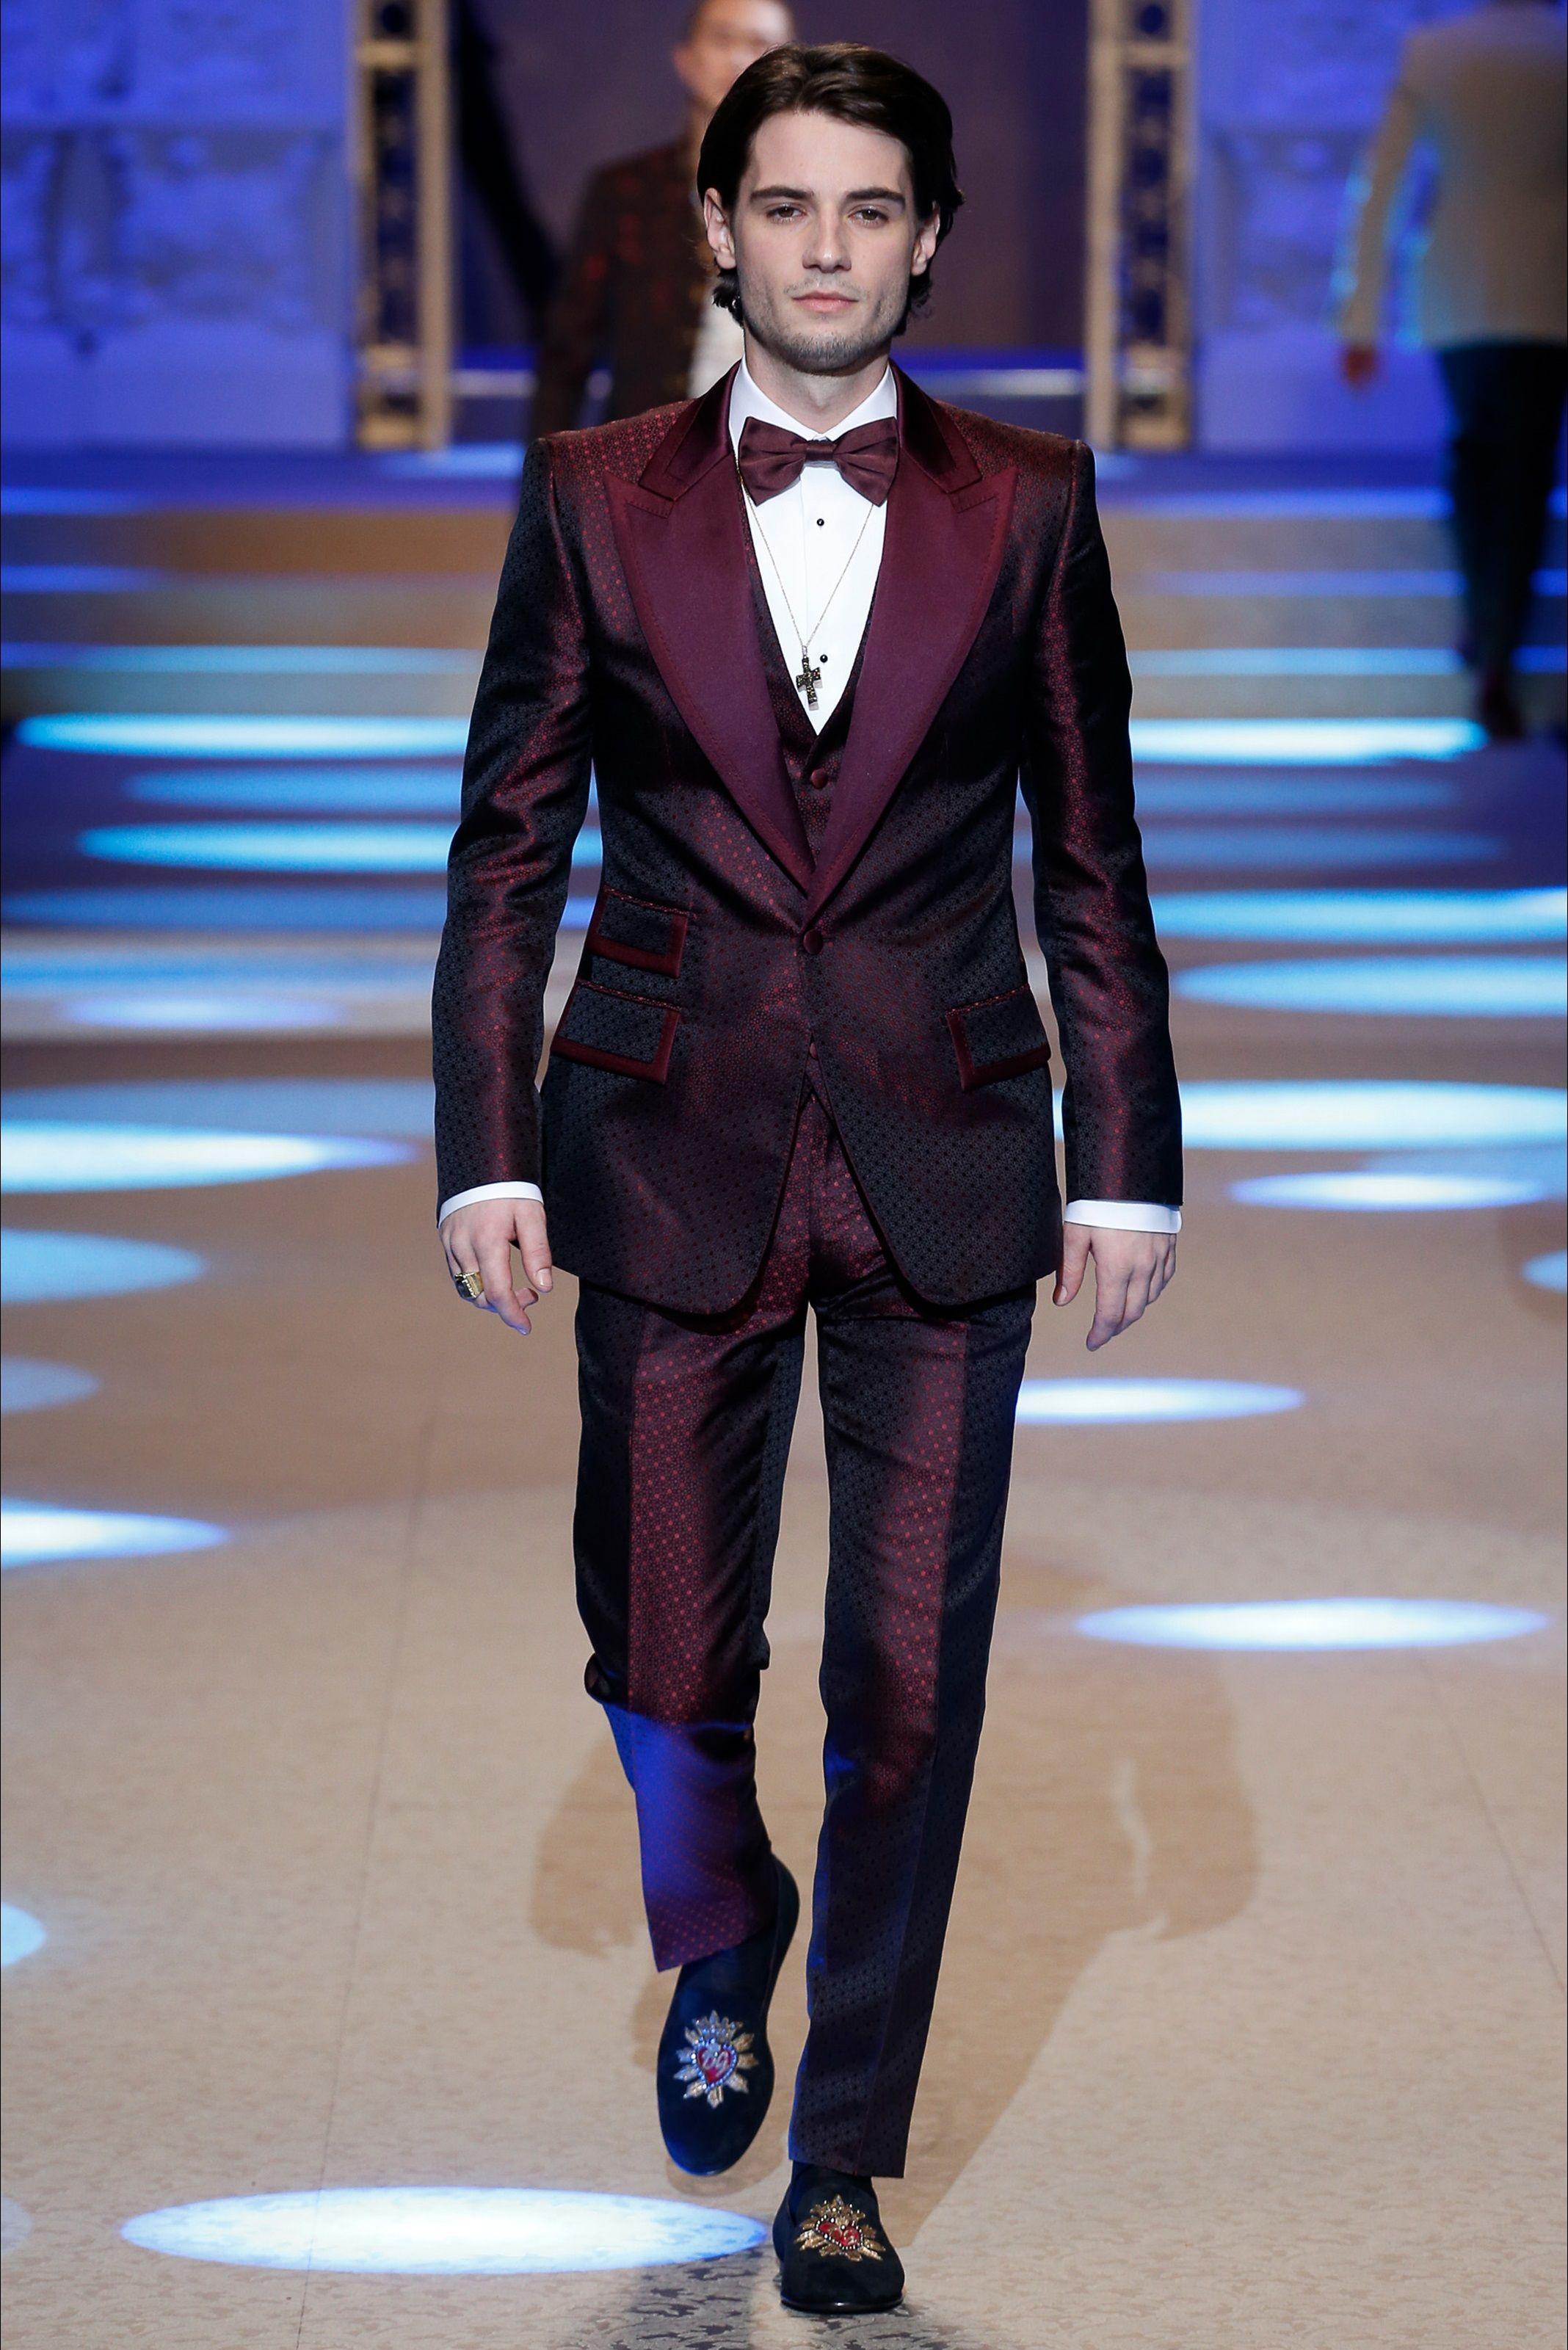 e9882362c6840 Sfilata Moda Uomo Dolce   Gabbana Milano - Autunno Inverno 2018-19 - Vogue